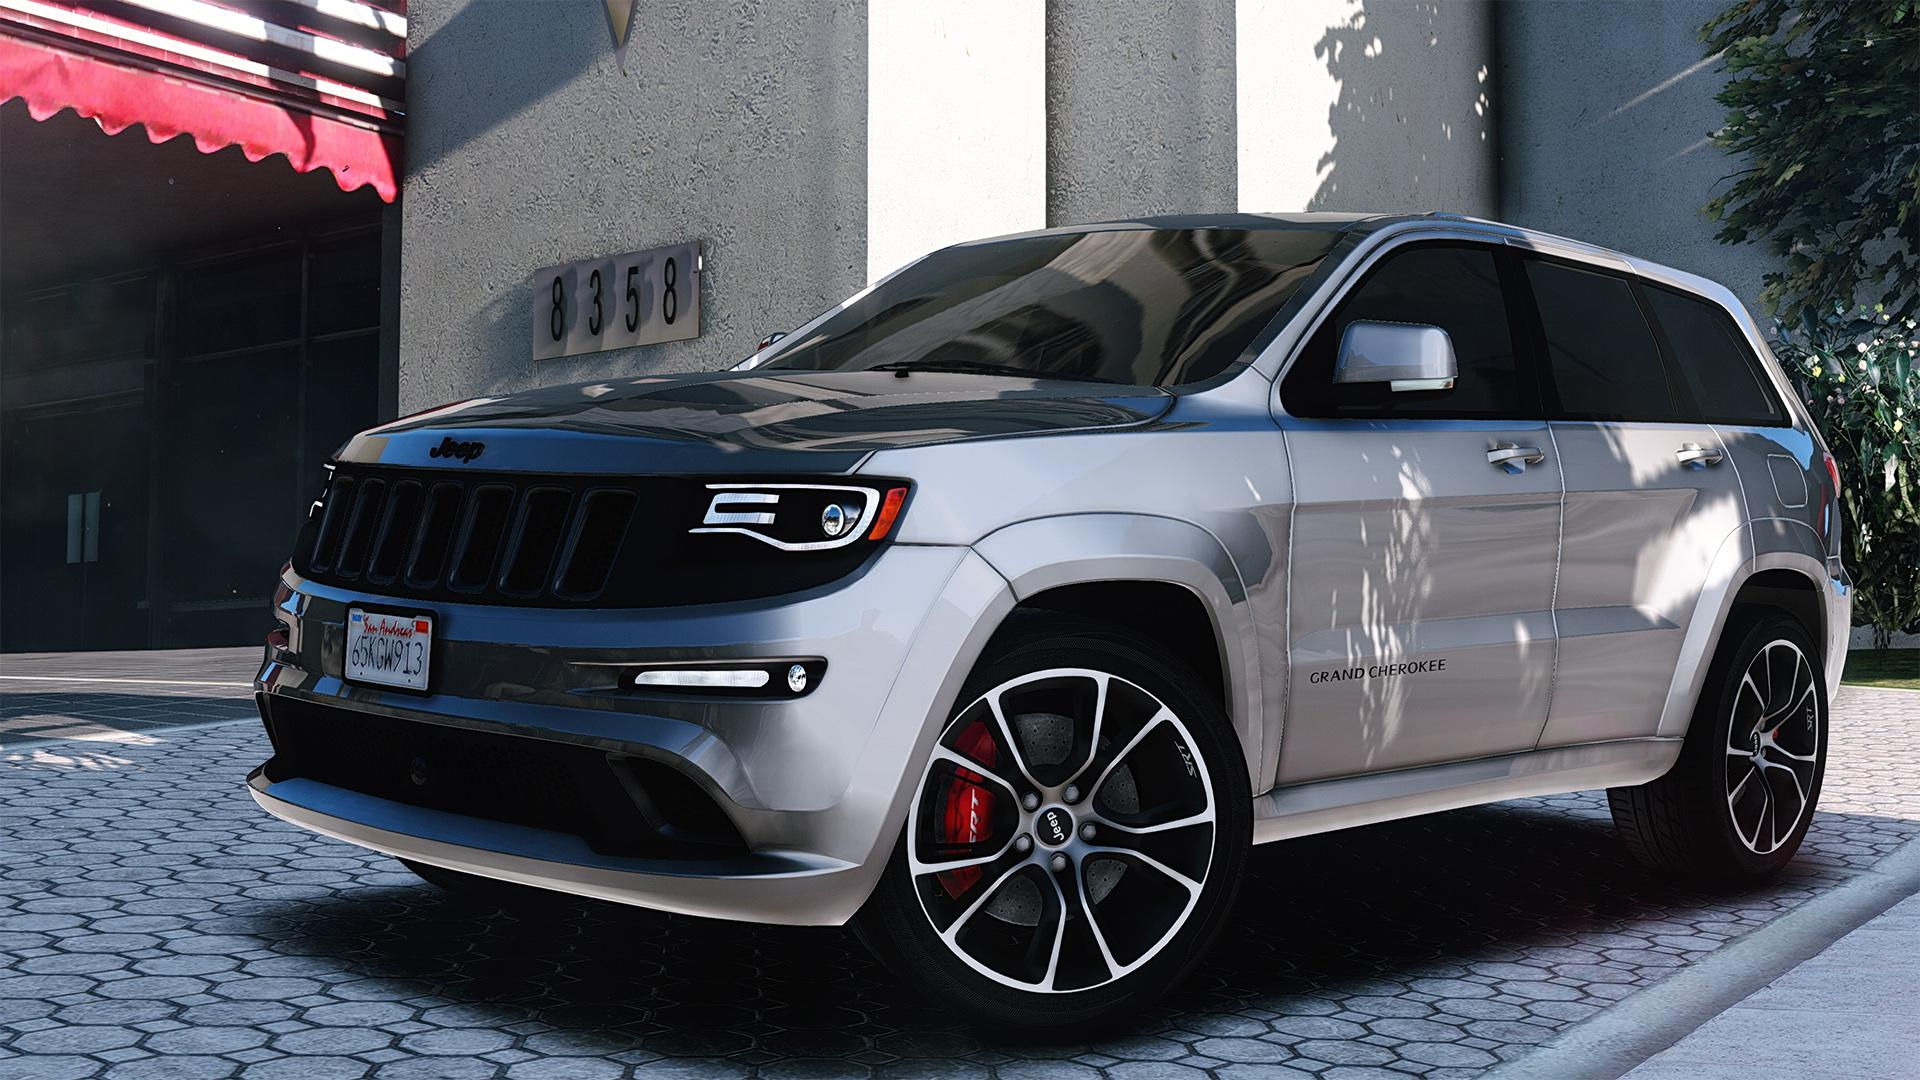 Jeep Srt 8 2017 >> Jeep SRT-8 2015 [Add-On] - GTA5-Mods.com